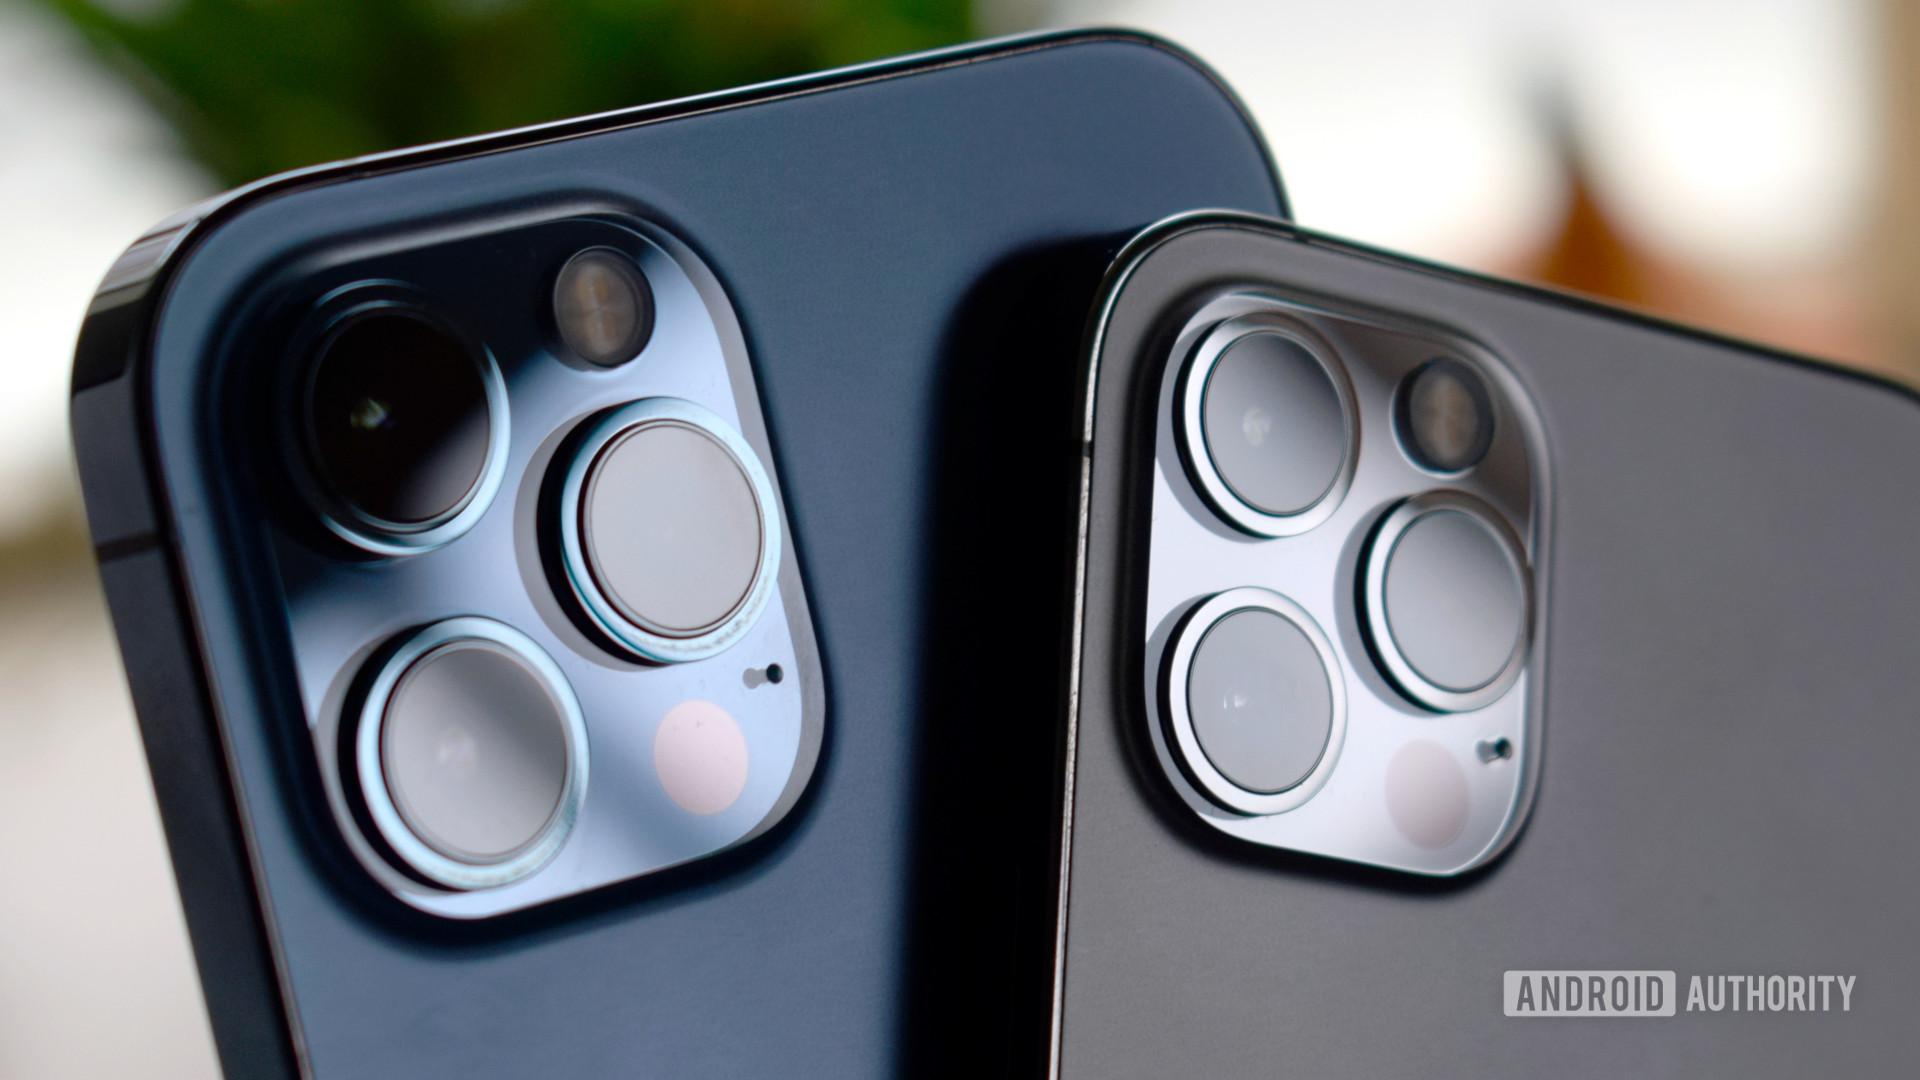 Apple iPhone 12 Pro vs iPhone 12 Max camera 2